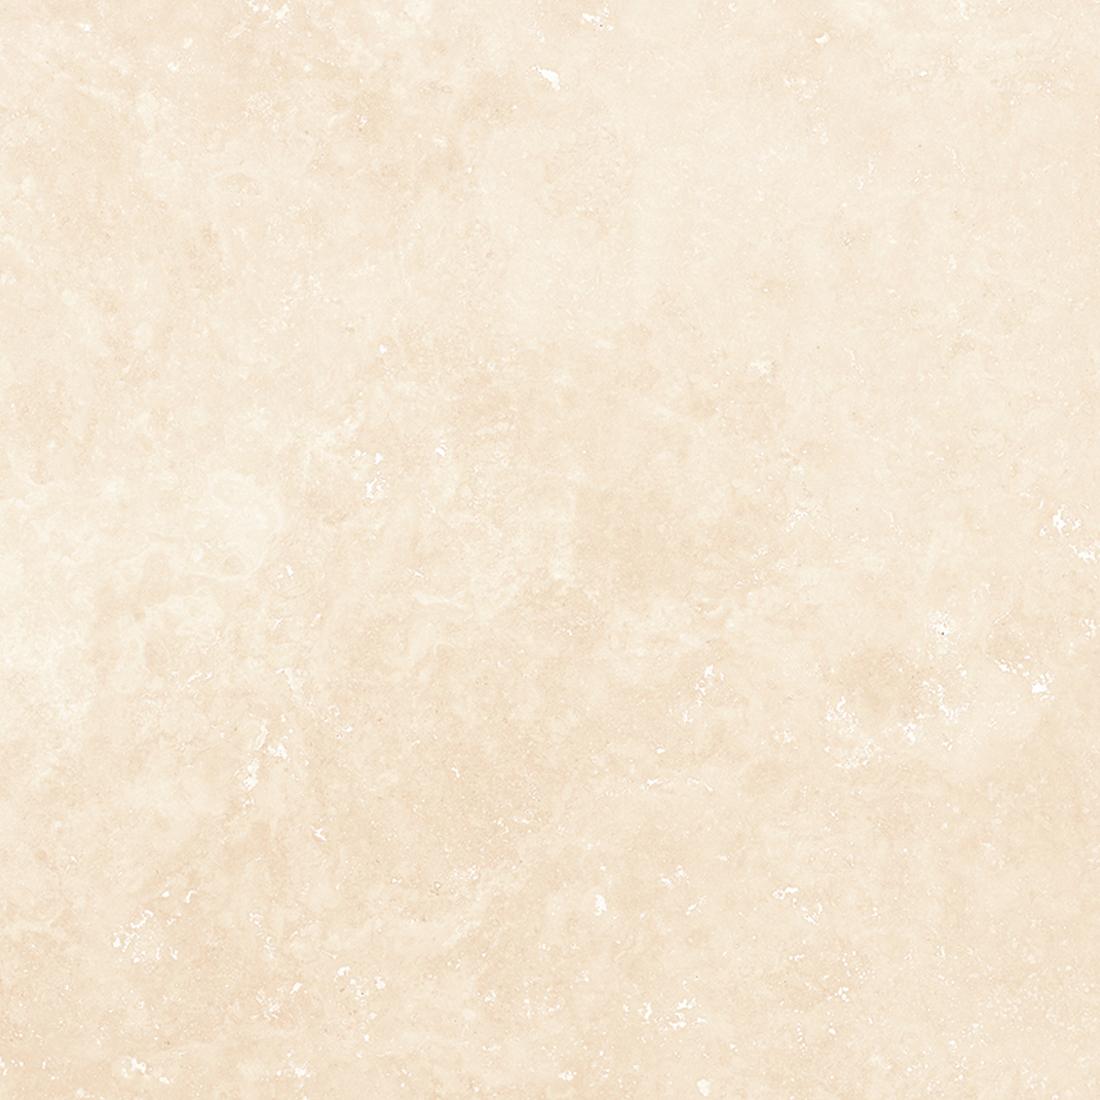 Nitco Aeon Marfil N5307 Matte Glazed Vitrified Tile